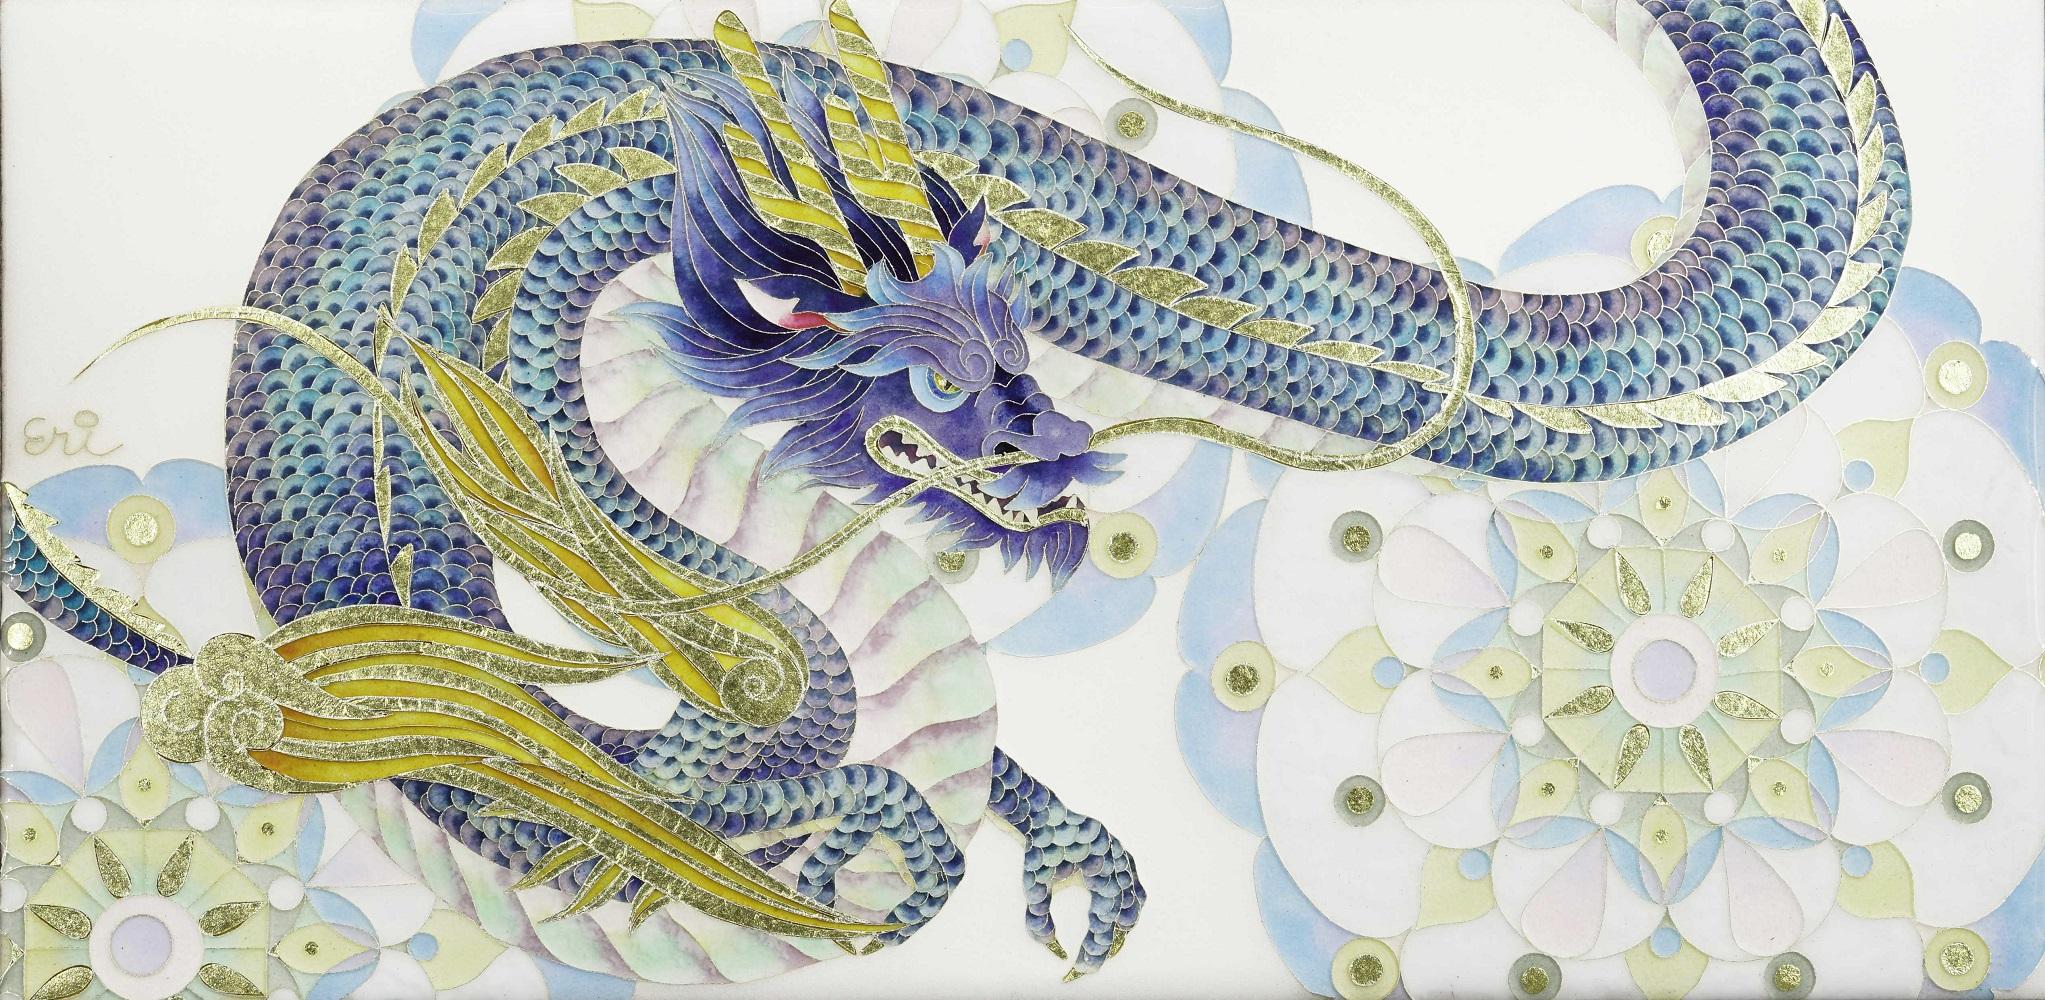 Eri Muranaka, Azure Dragon of the East, 2021, 120×240×5mm, Cloisonné enamel ware (silver enamel,  glass glaze, gold leaf on copper plate)